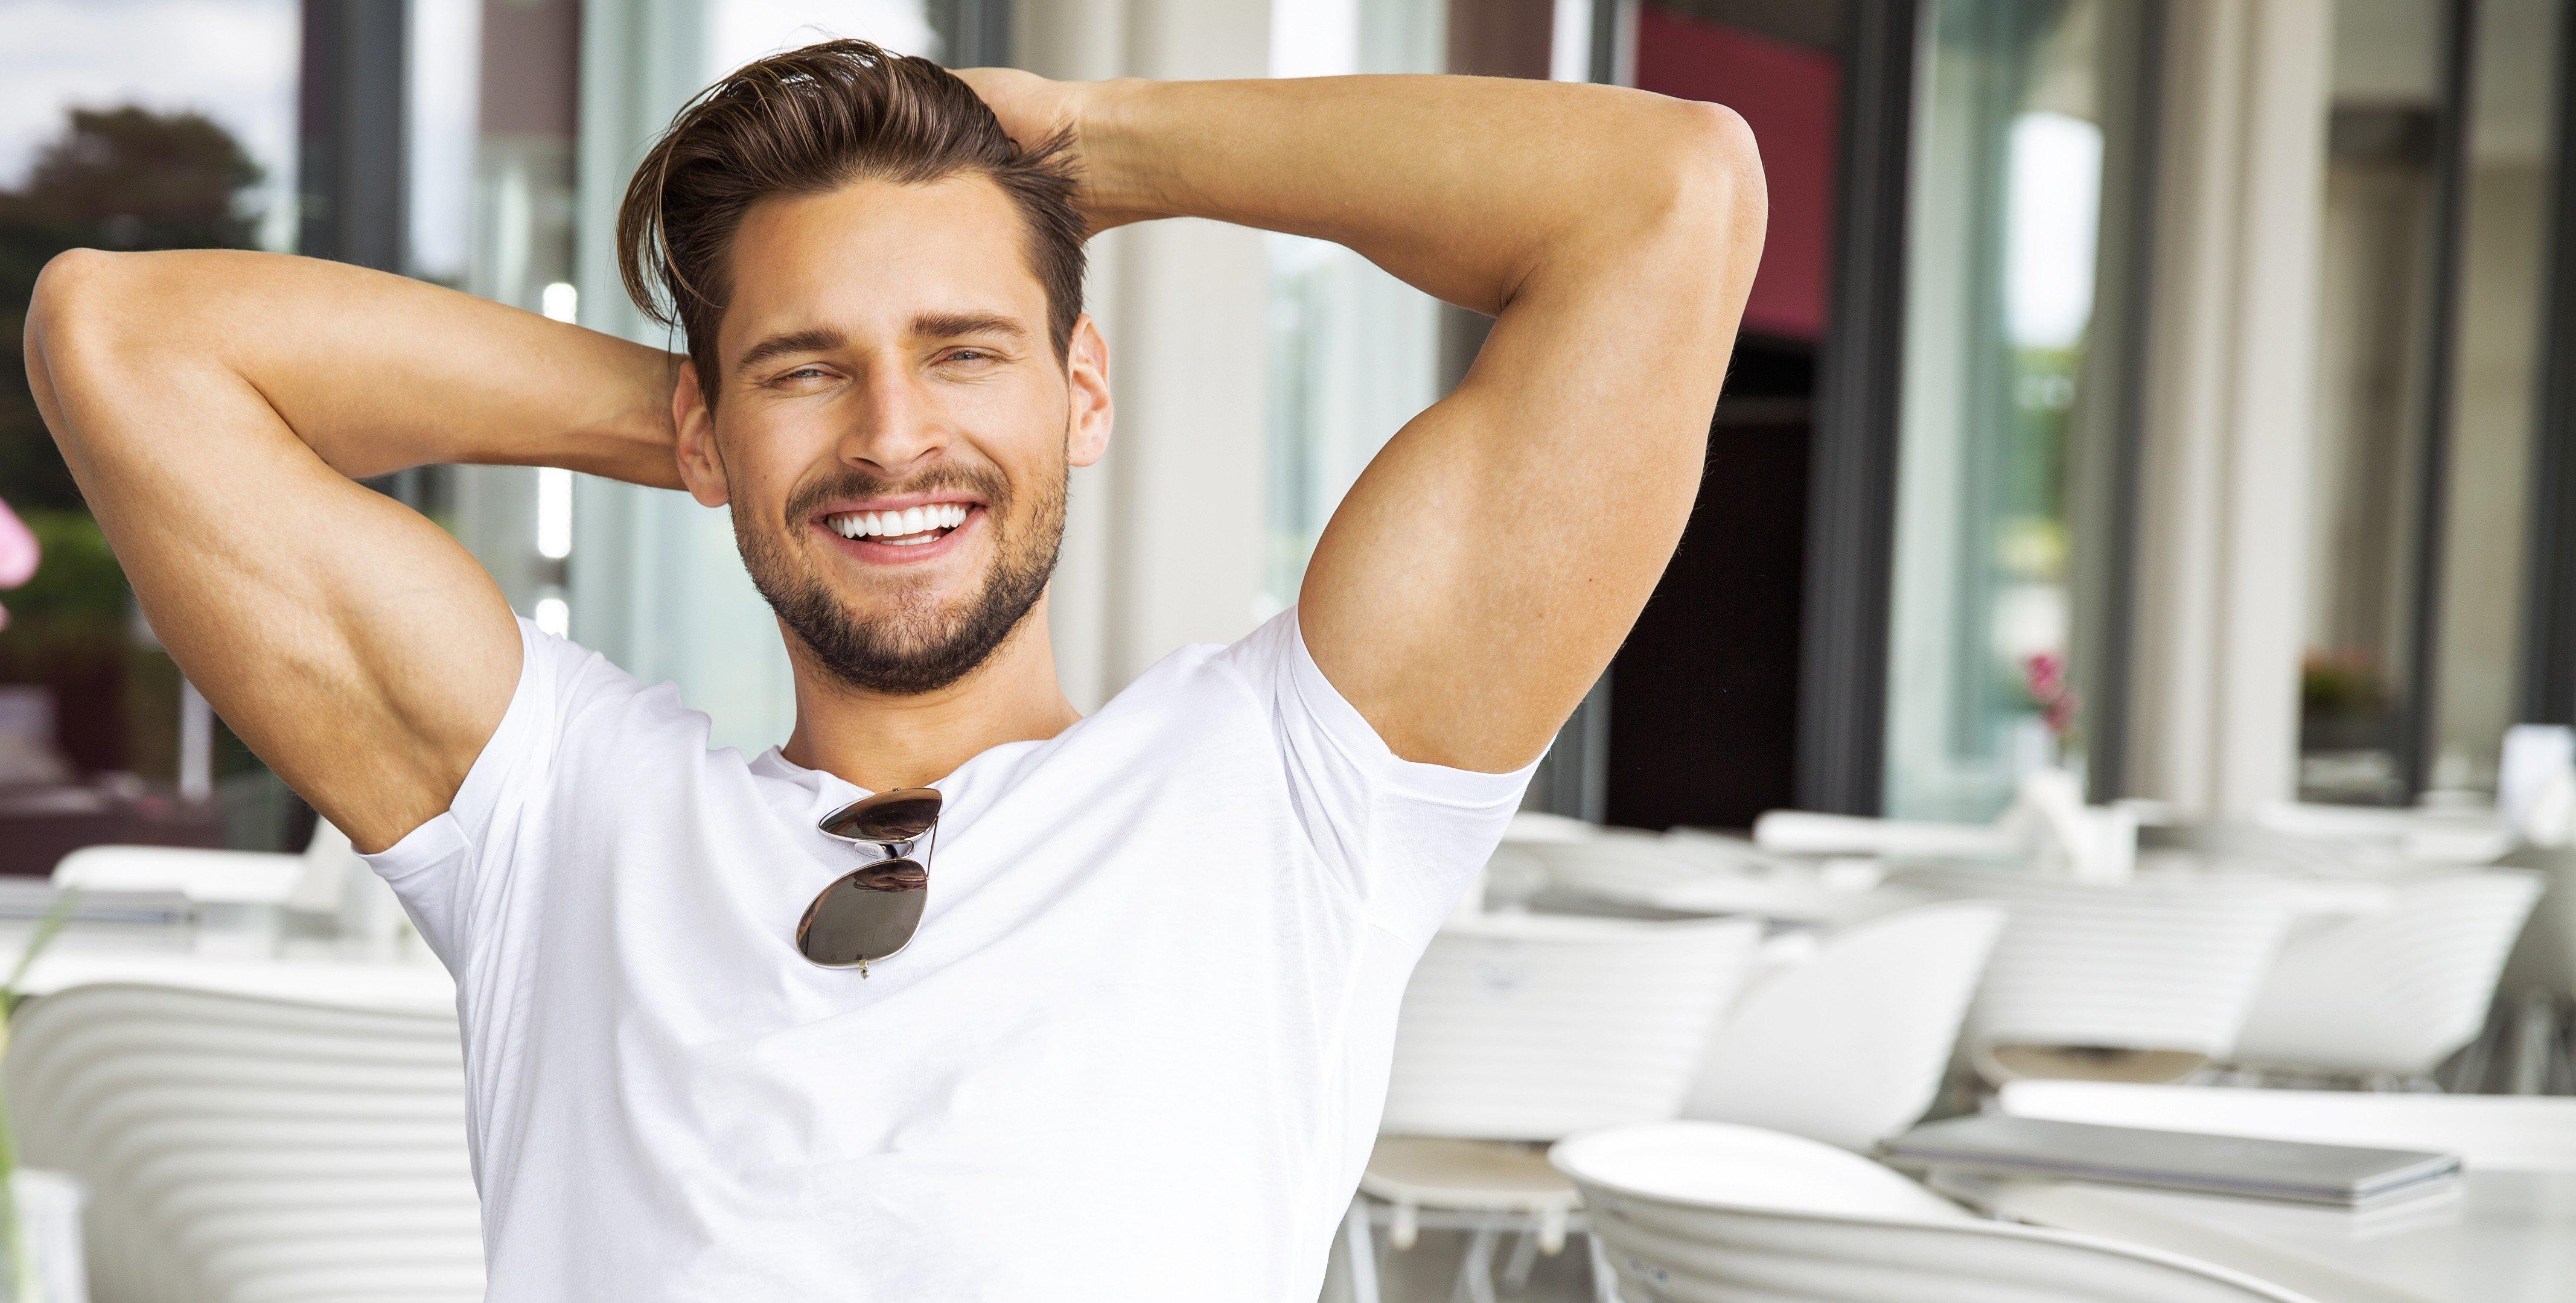 Männer-Trendfrisuren 11: Die coolsten Styles